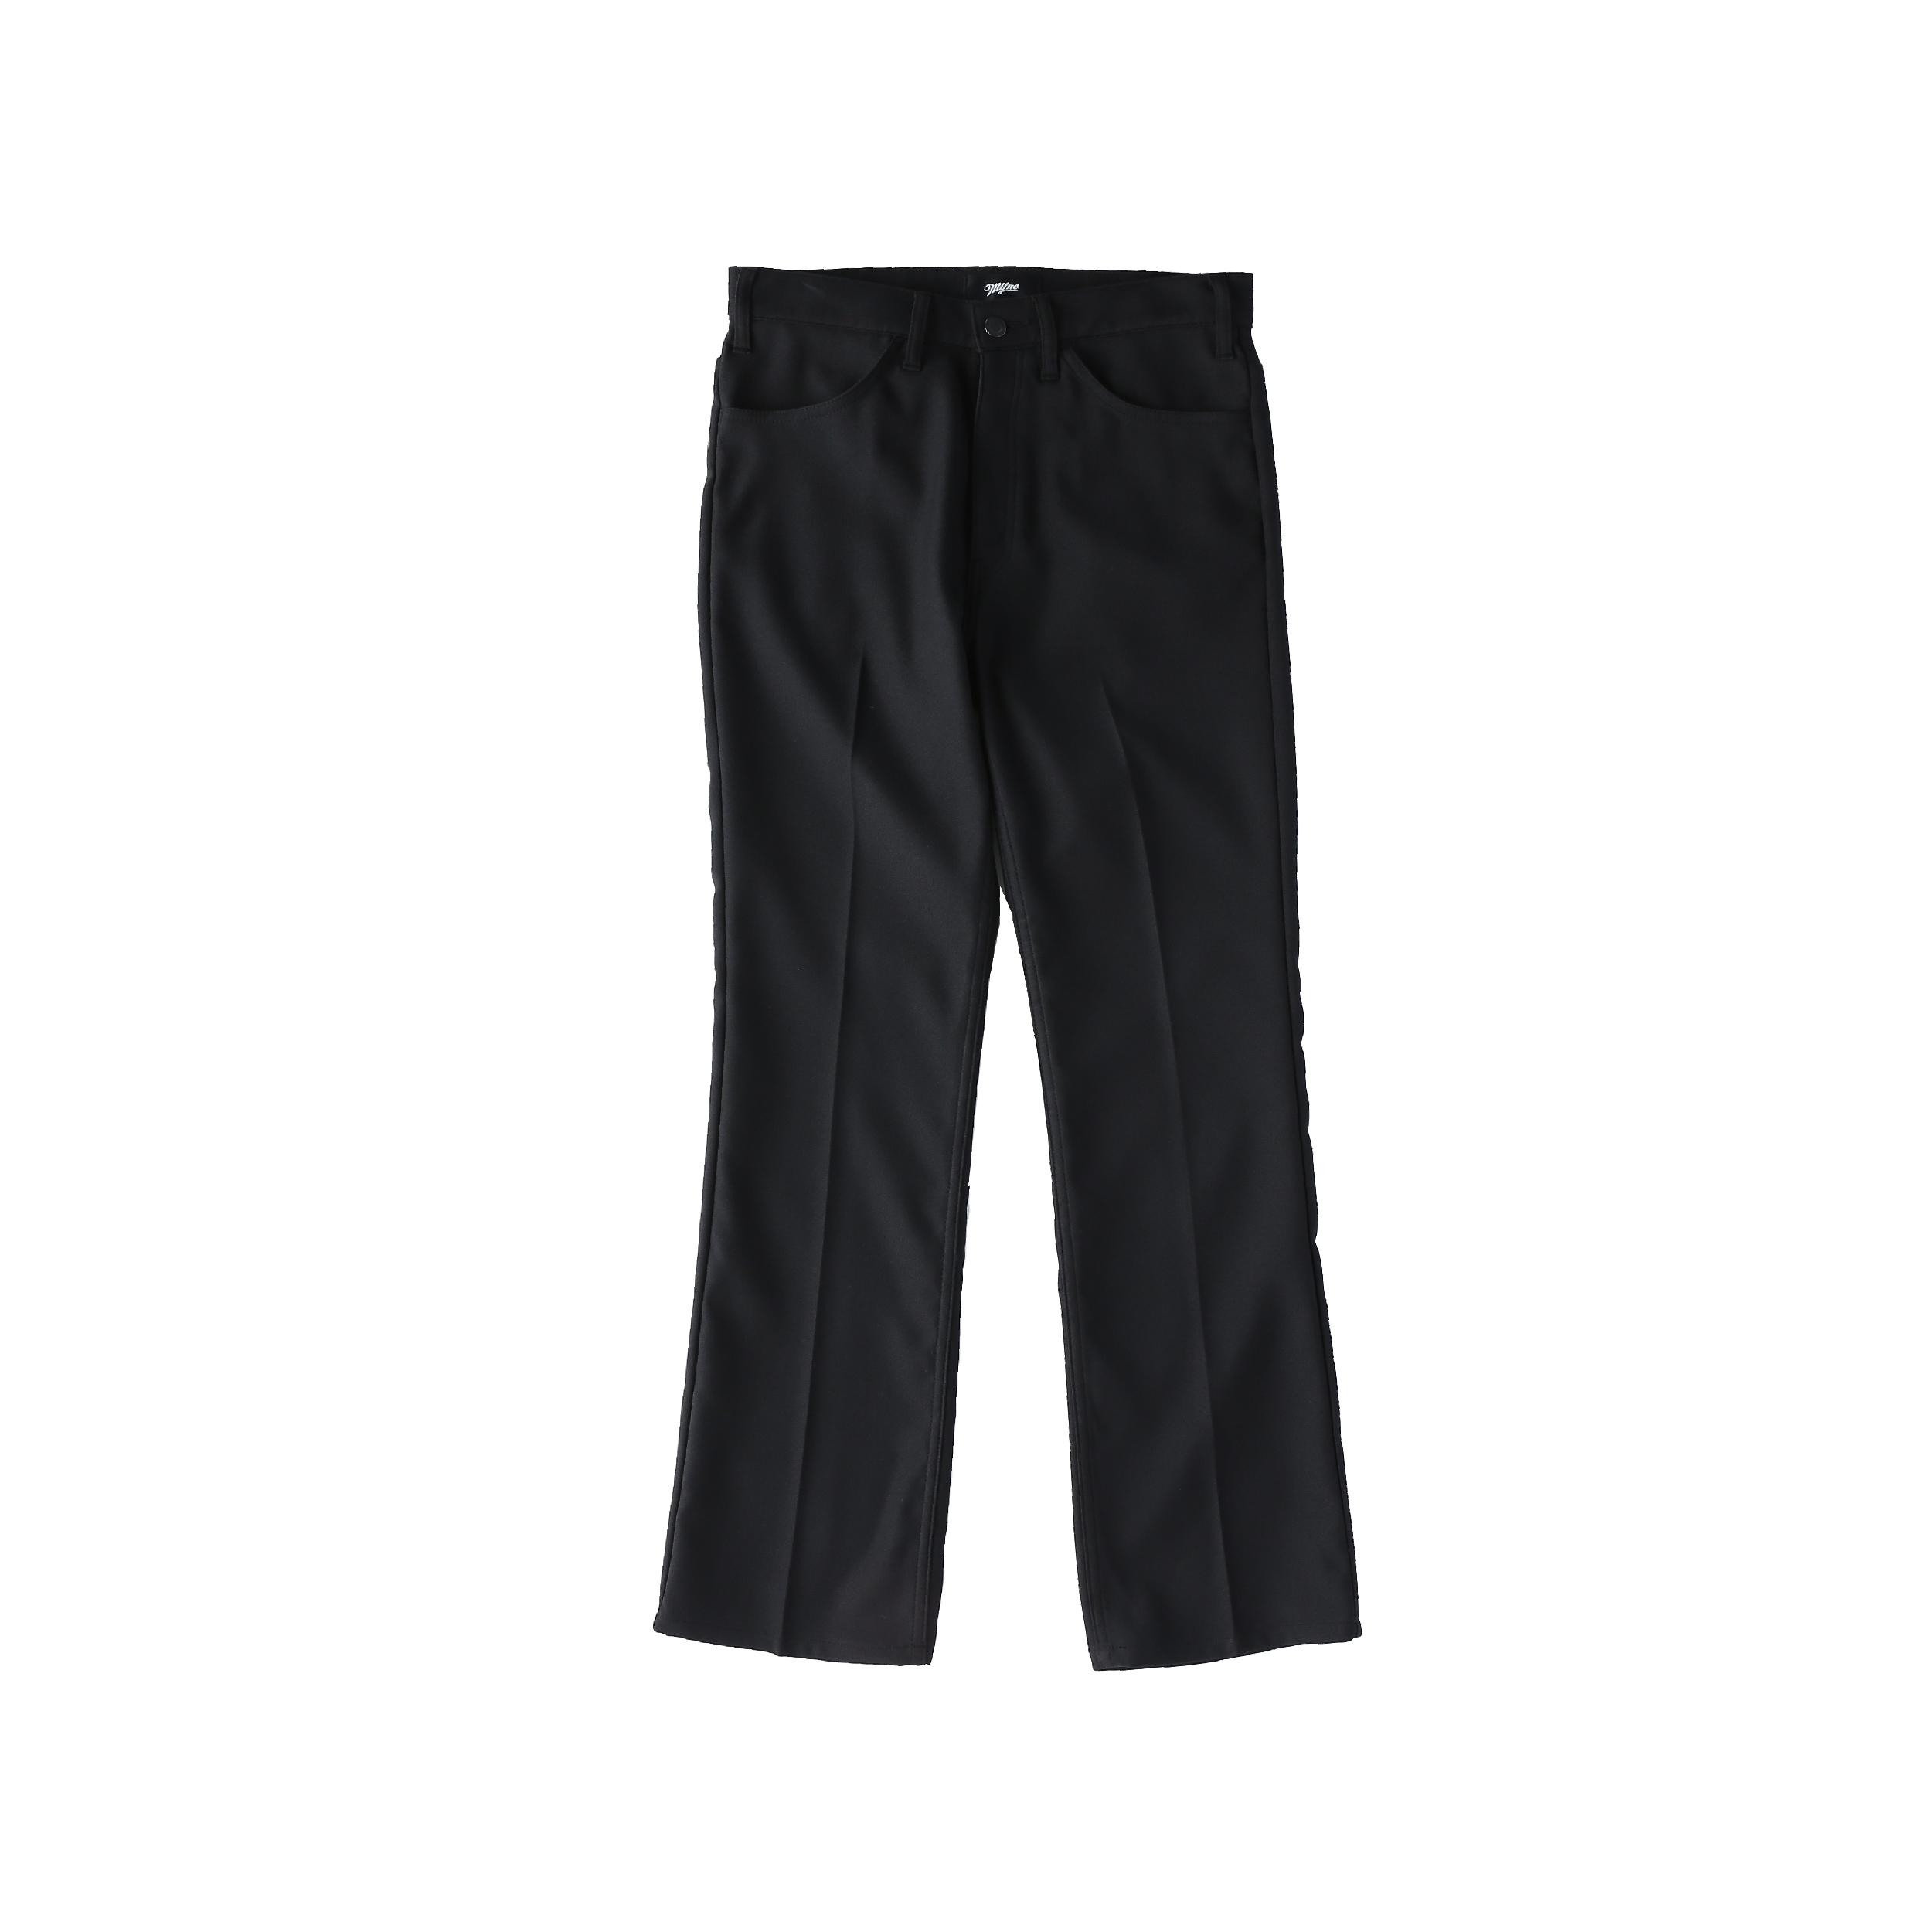 Wappen boot-cut pants / BLACK - 画像1